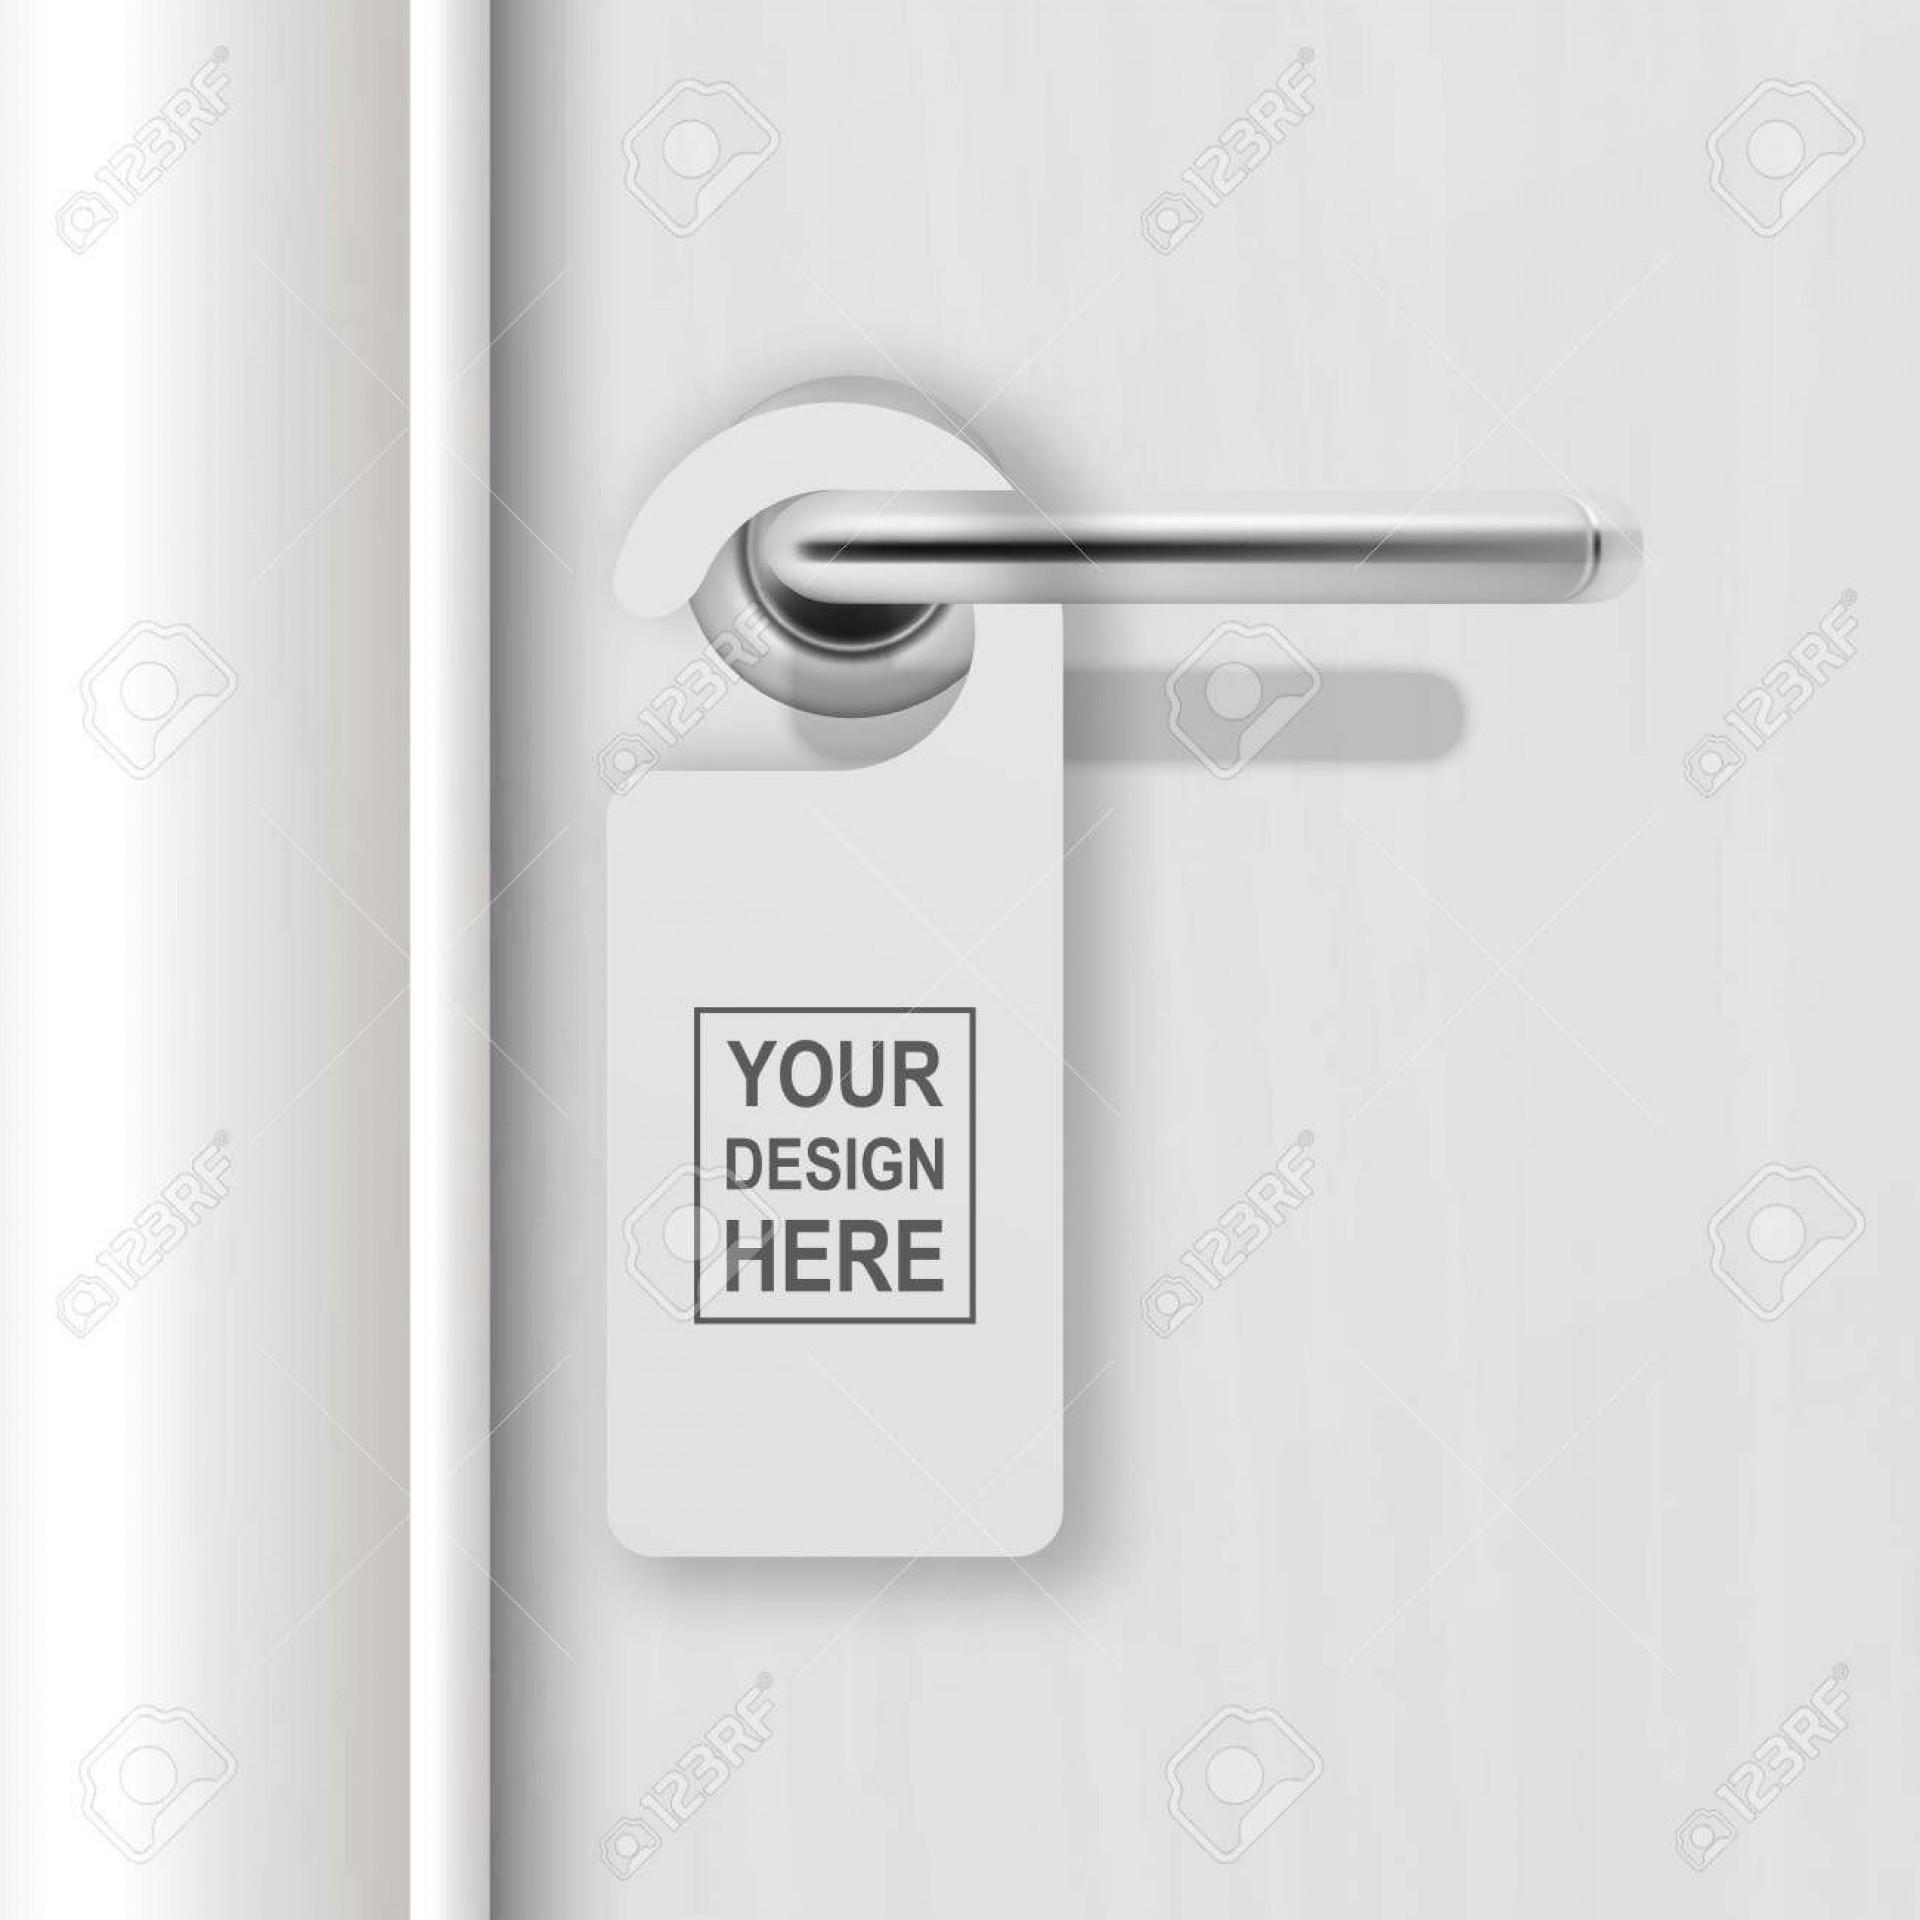 002 Amazing Blank Door Hanger Template High Definition  Free Printable Microsoft Word1920